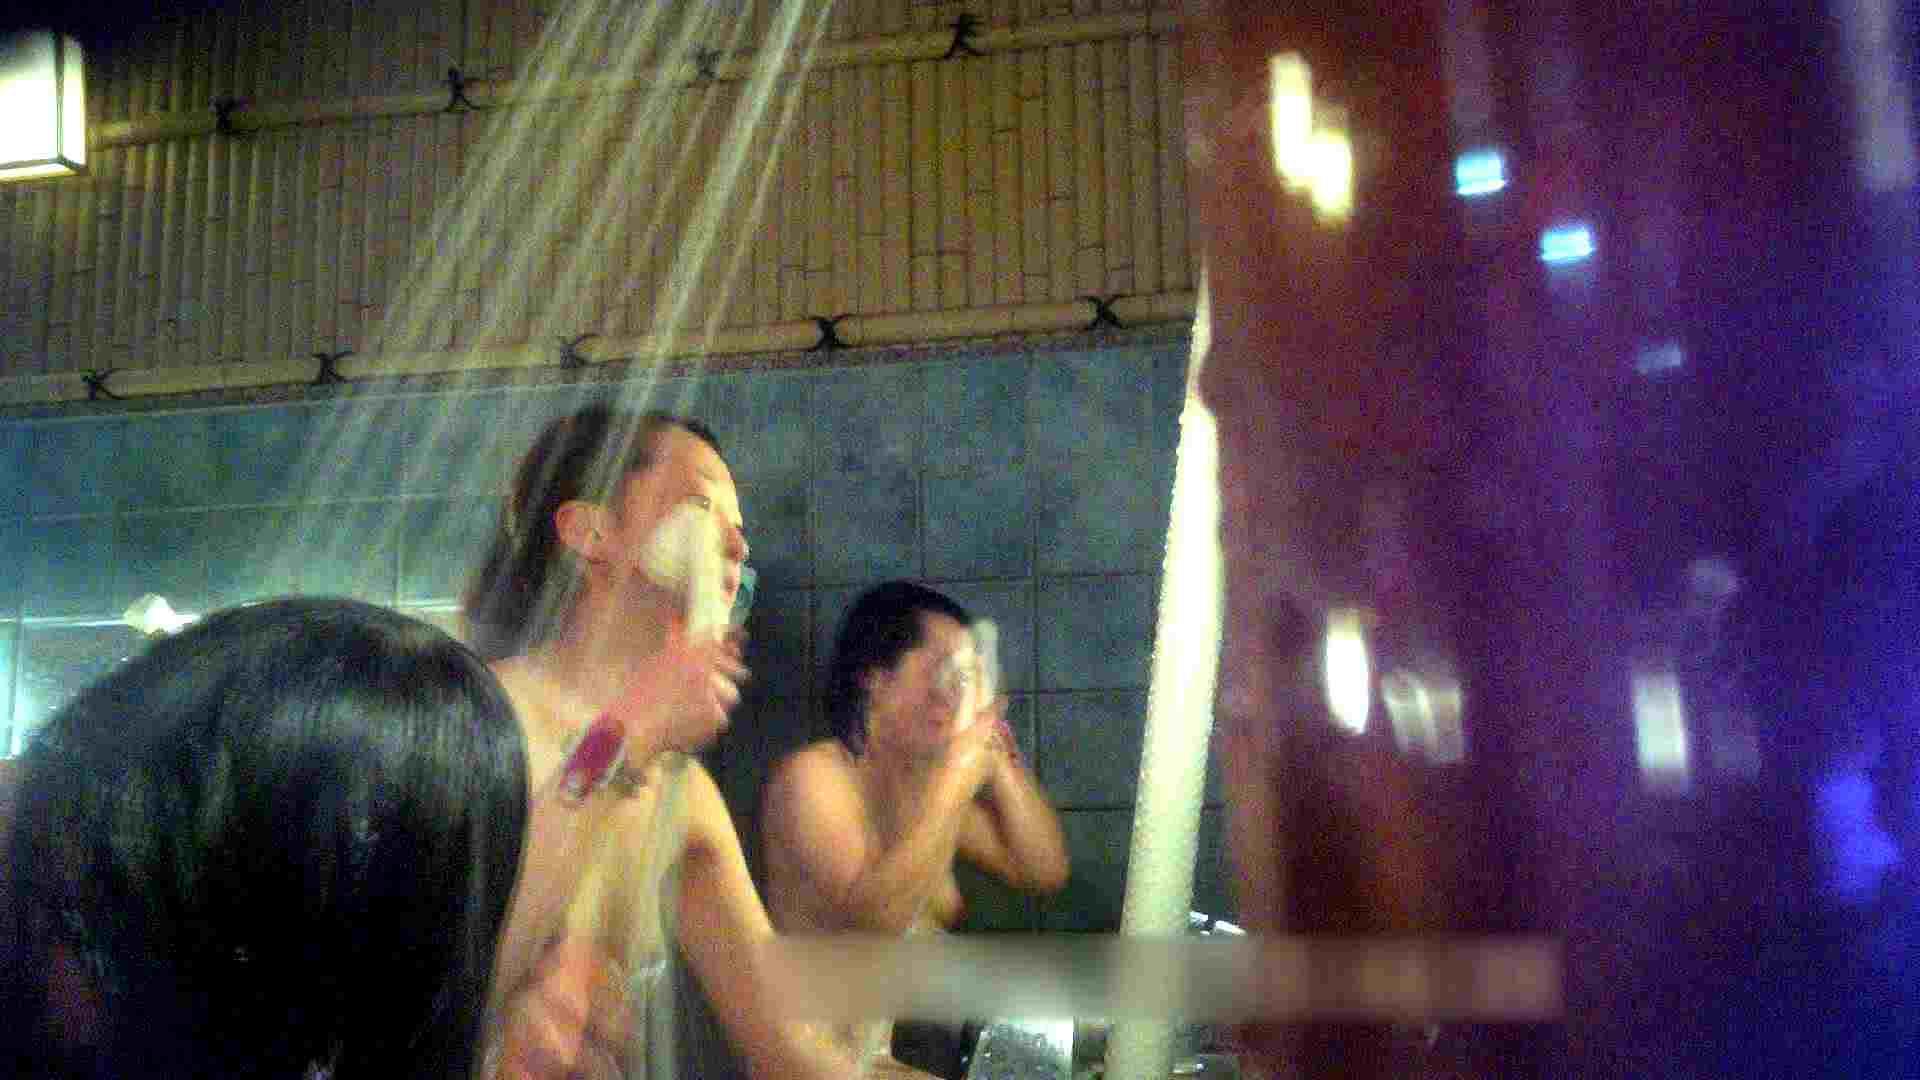 TG.12 【上等兵】いやぁ若い!ぷっちぷちギャル!でも時間短い・・・ 潜入   女風呂  67pic 34